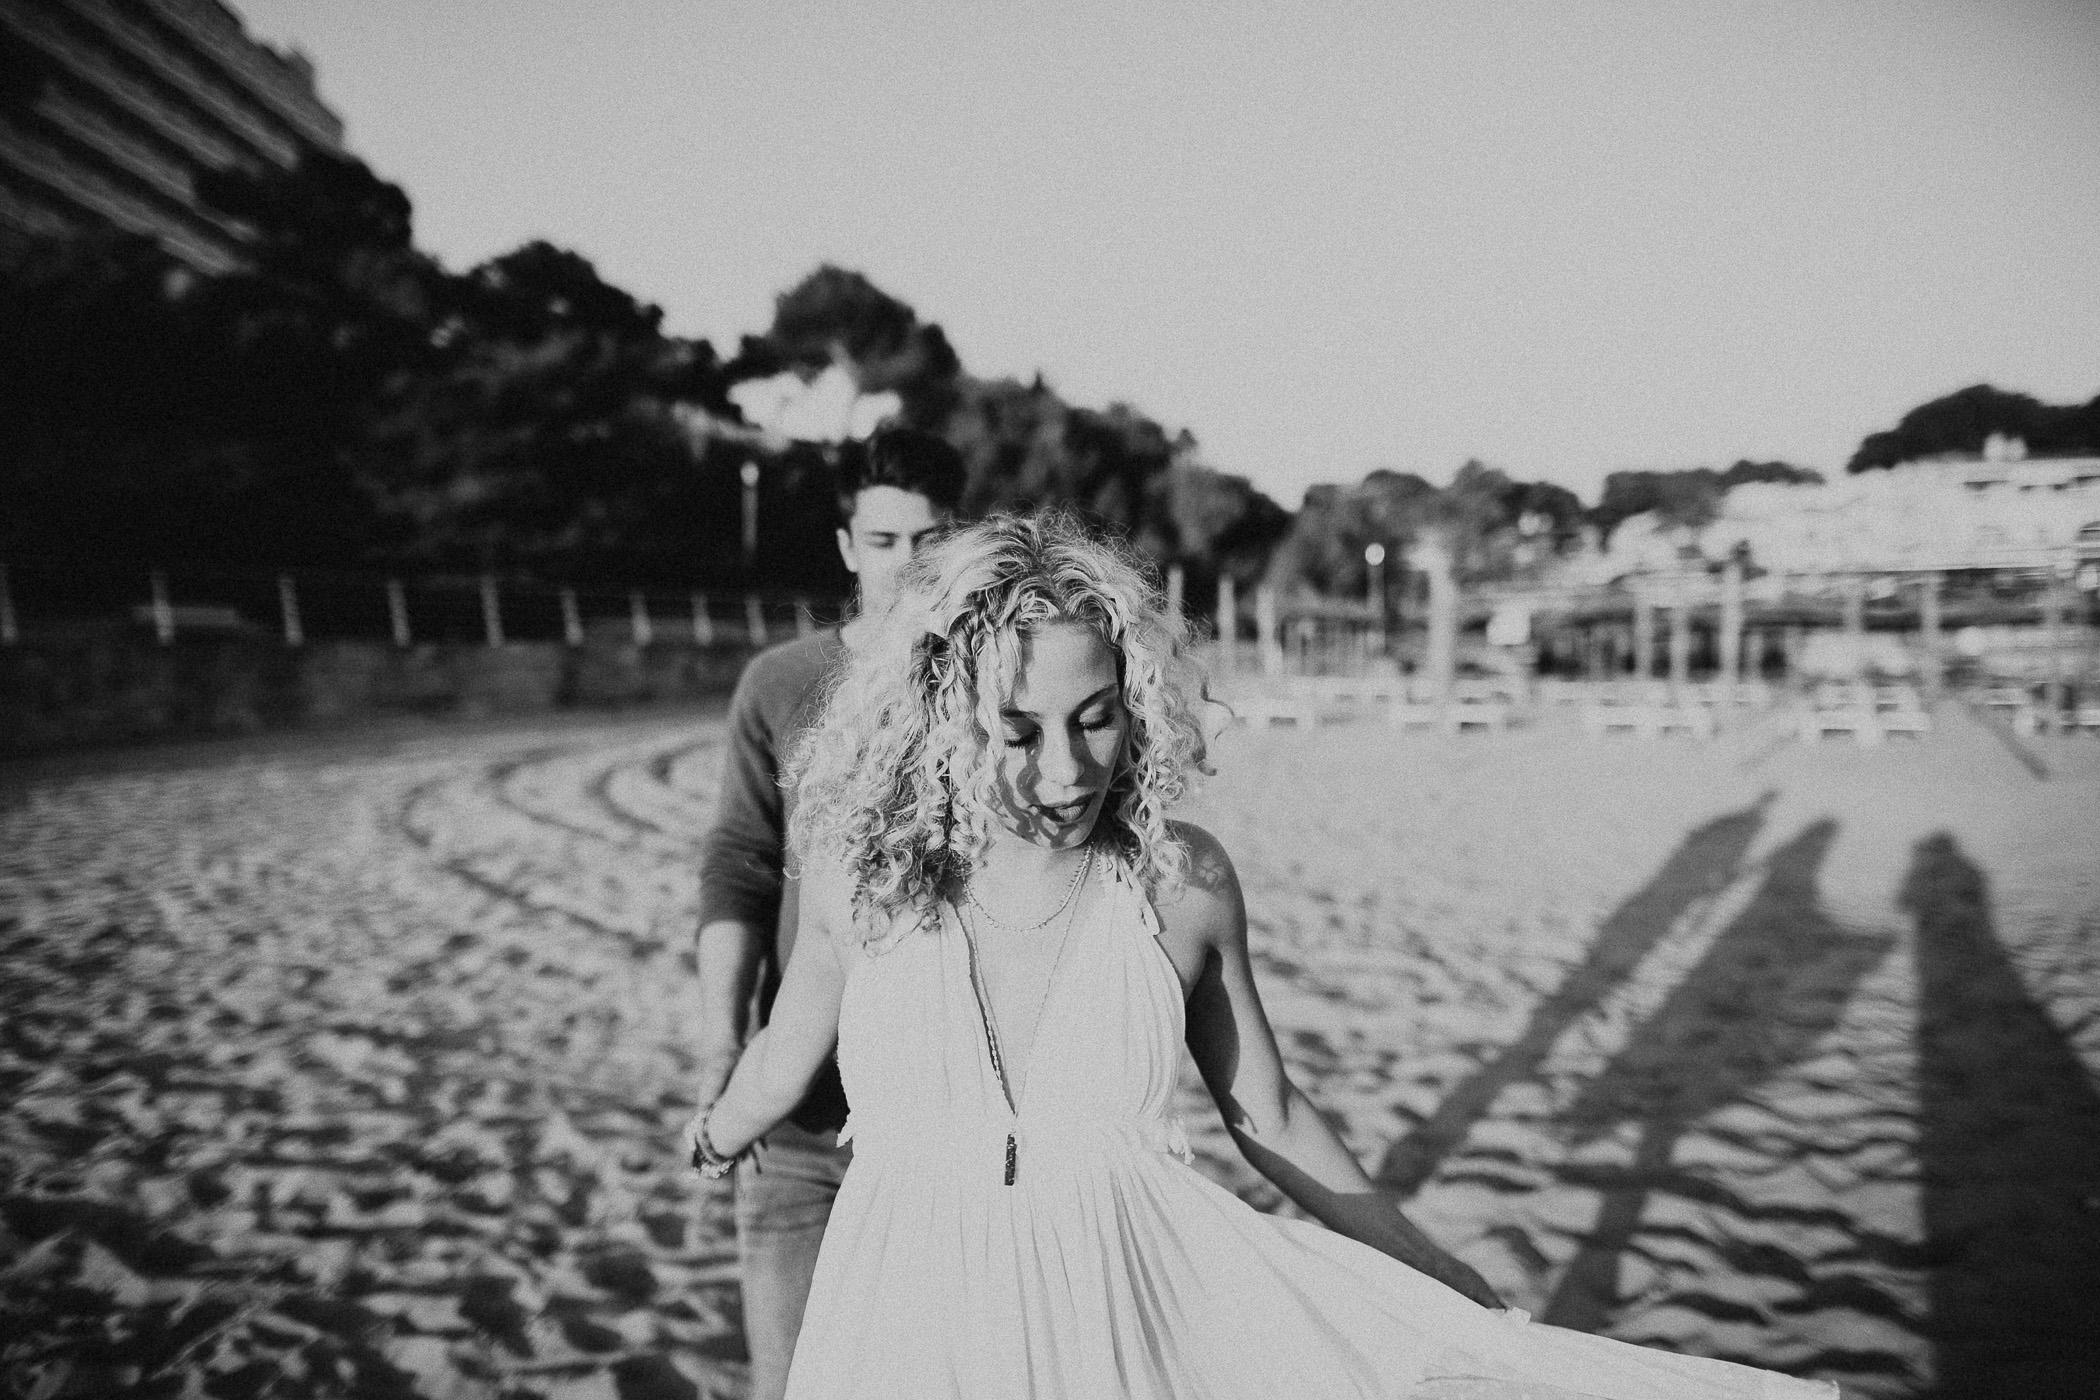 DanielaMarquardtPhotography_elopement_mallorca_spain_paguera_palma_charlyandbela_101